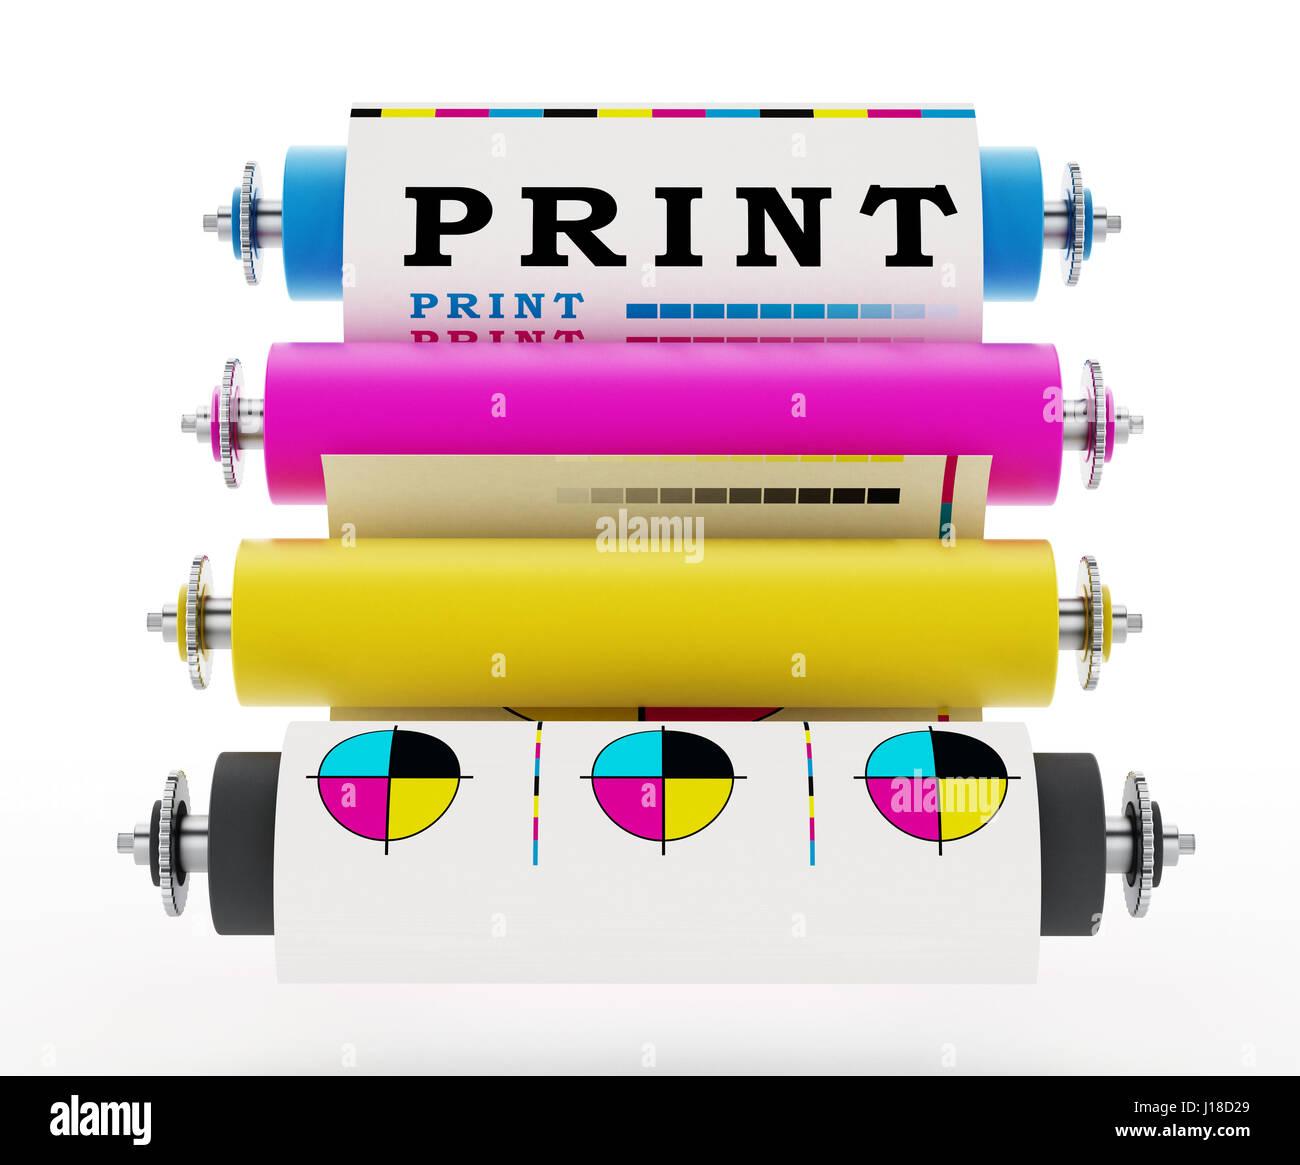 CMYK Printing press with test print. 3D illustration. - Stock Image